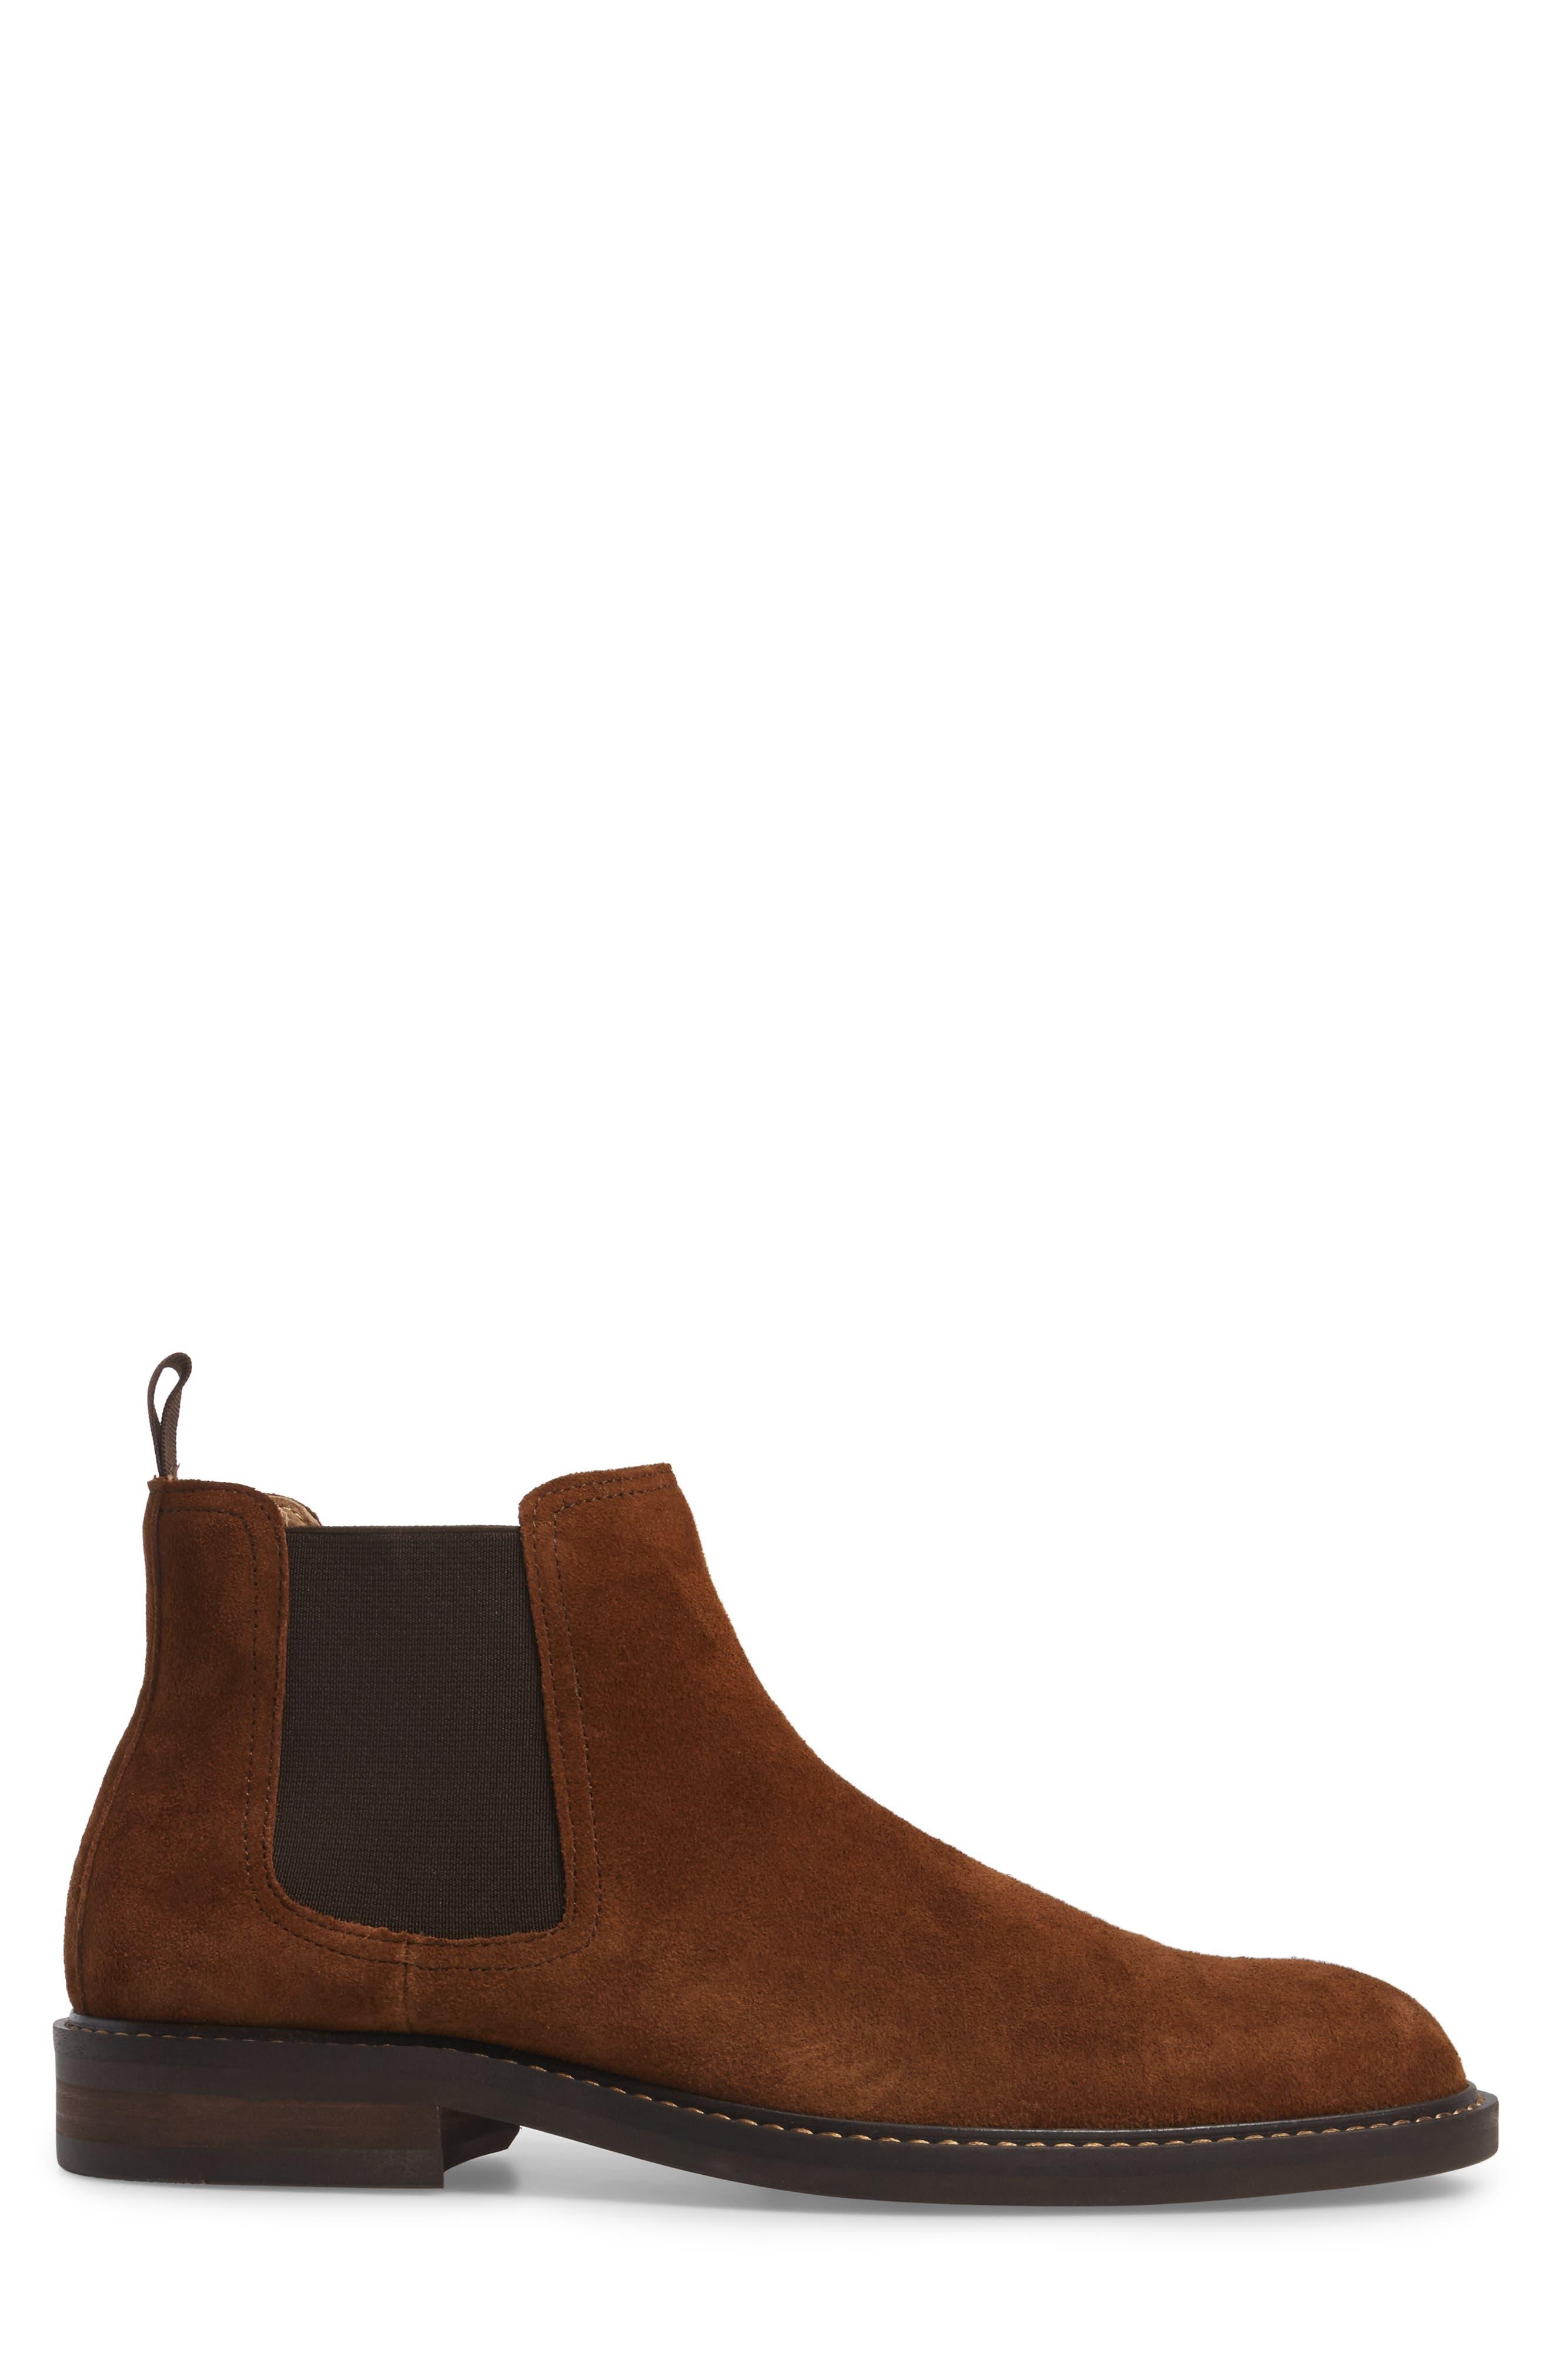 Horton Chelsea Boot,                             Alternate thumbnail 28, color,